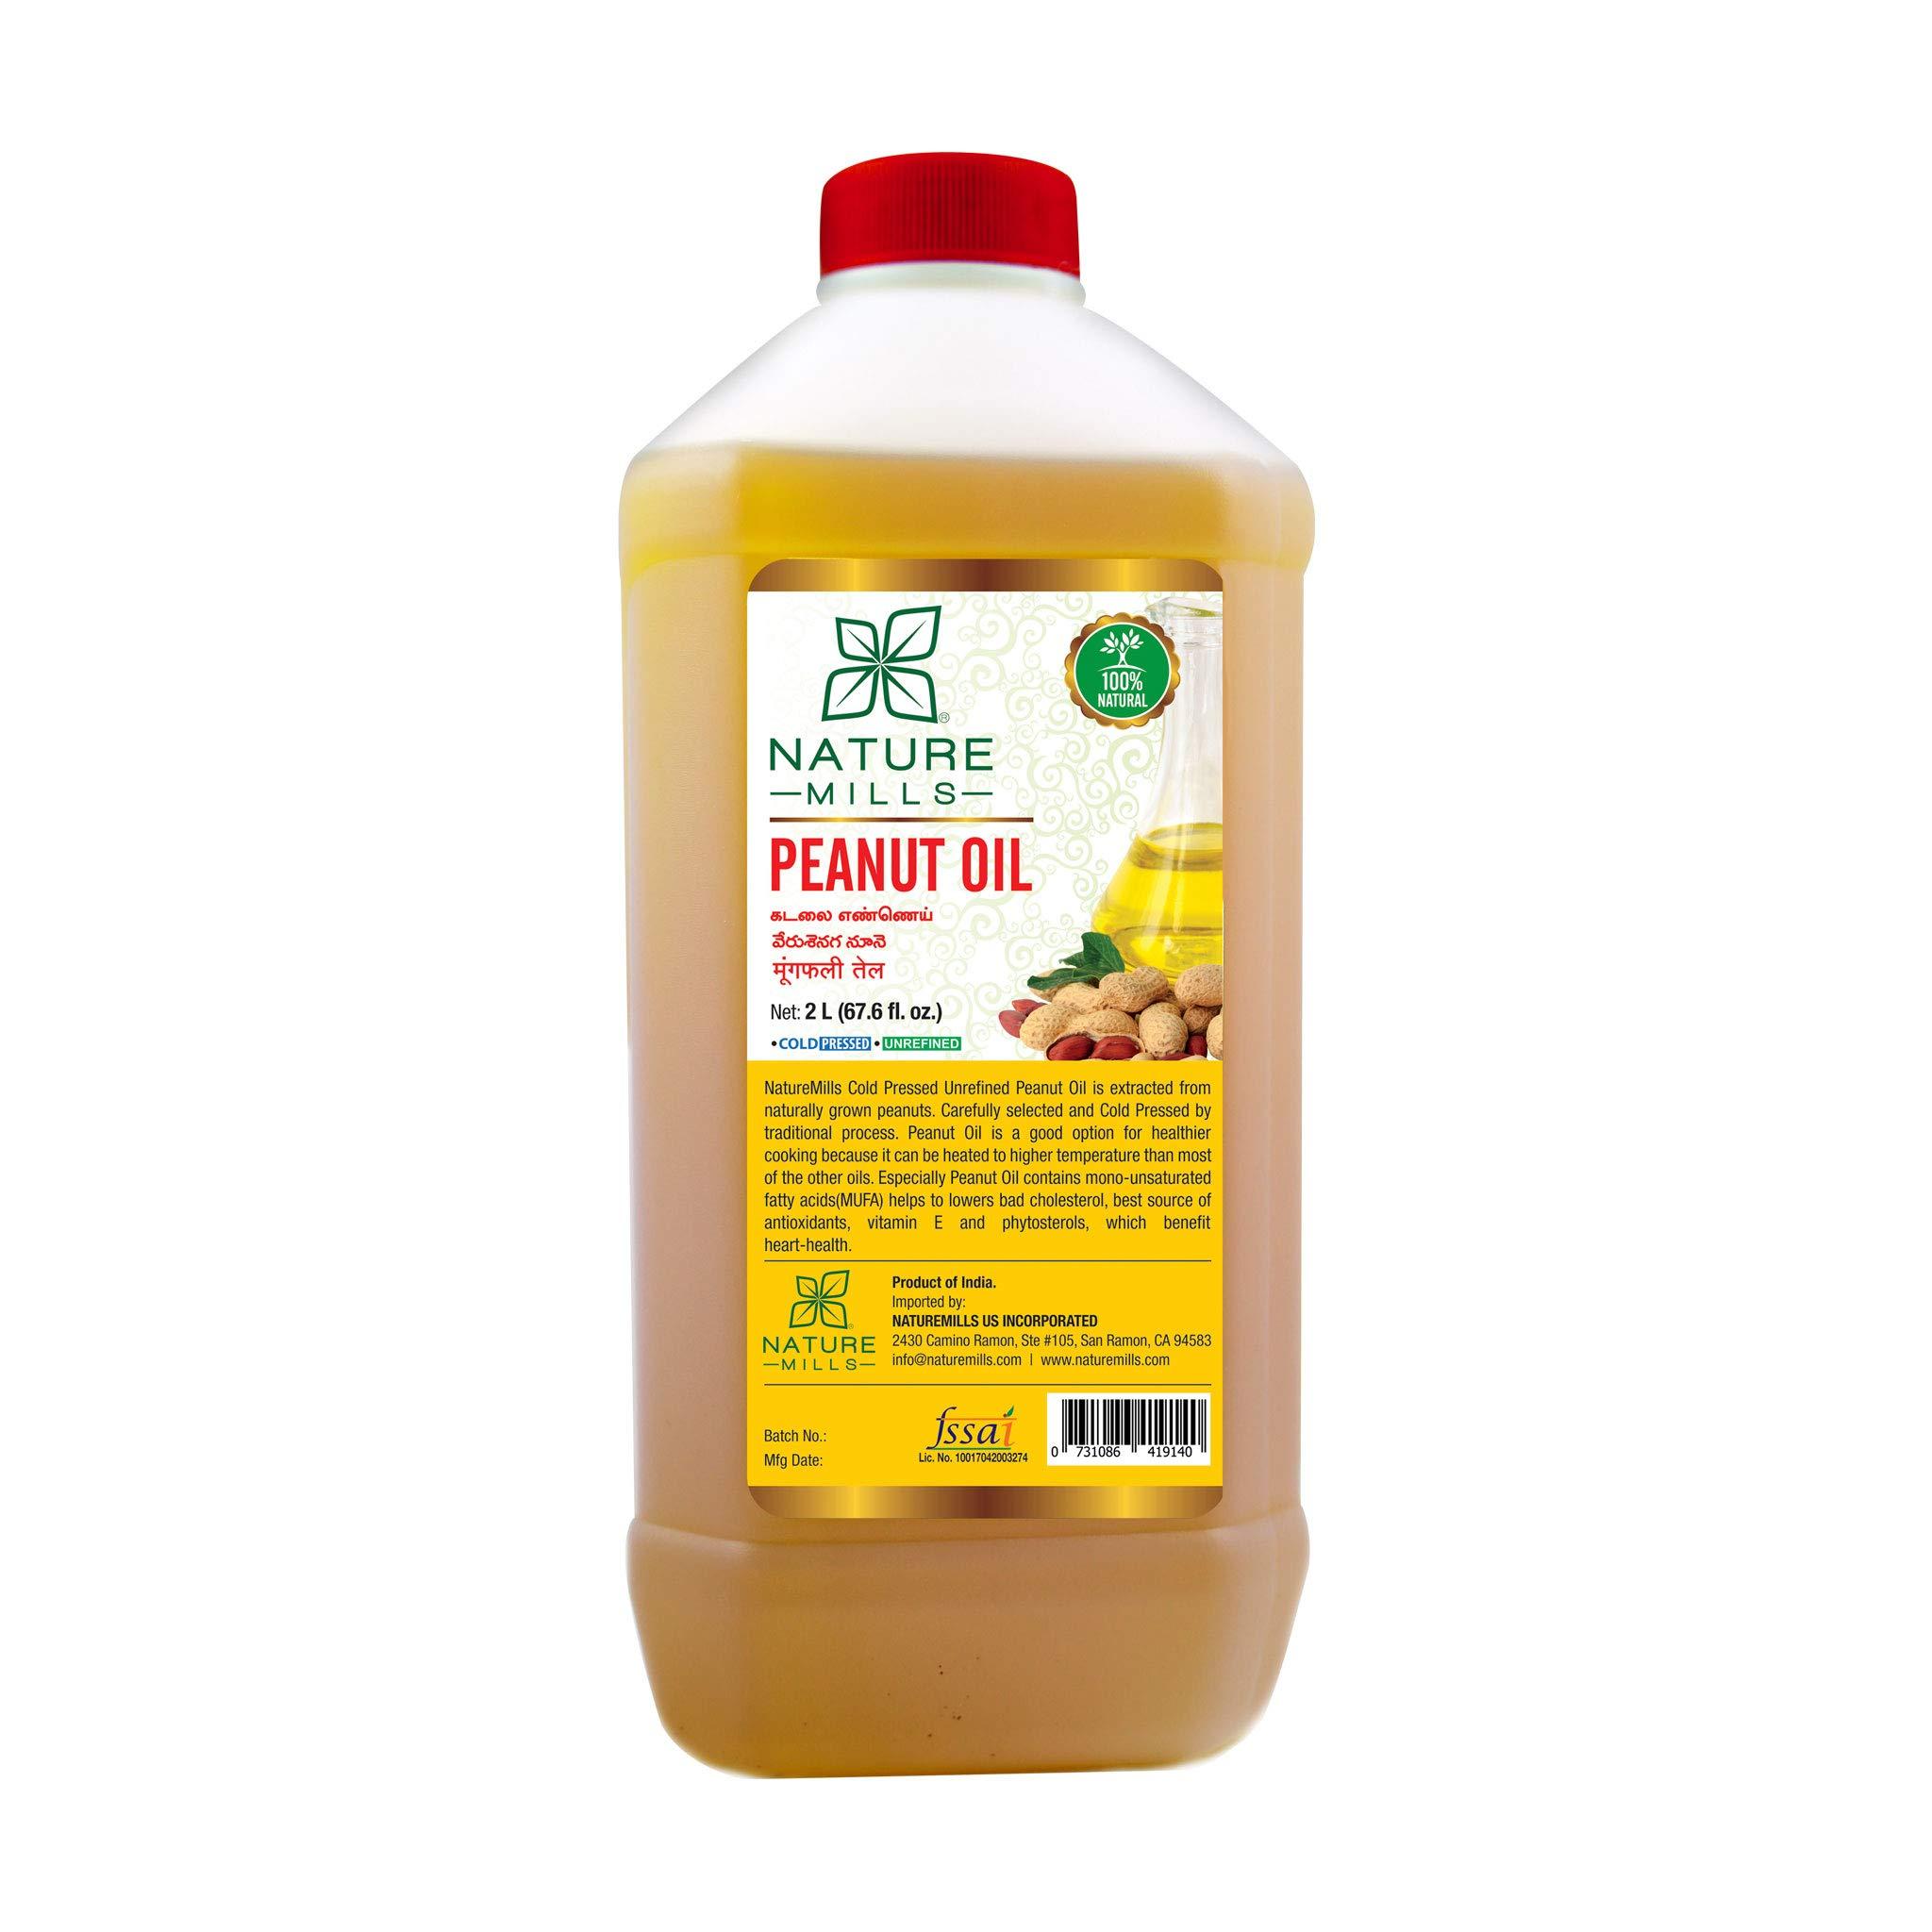 Natural Peanut Oil - 2 Liter - 67.6 Fl.Oz